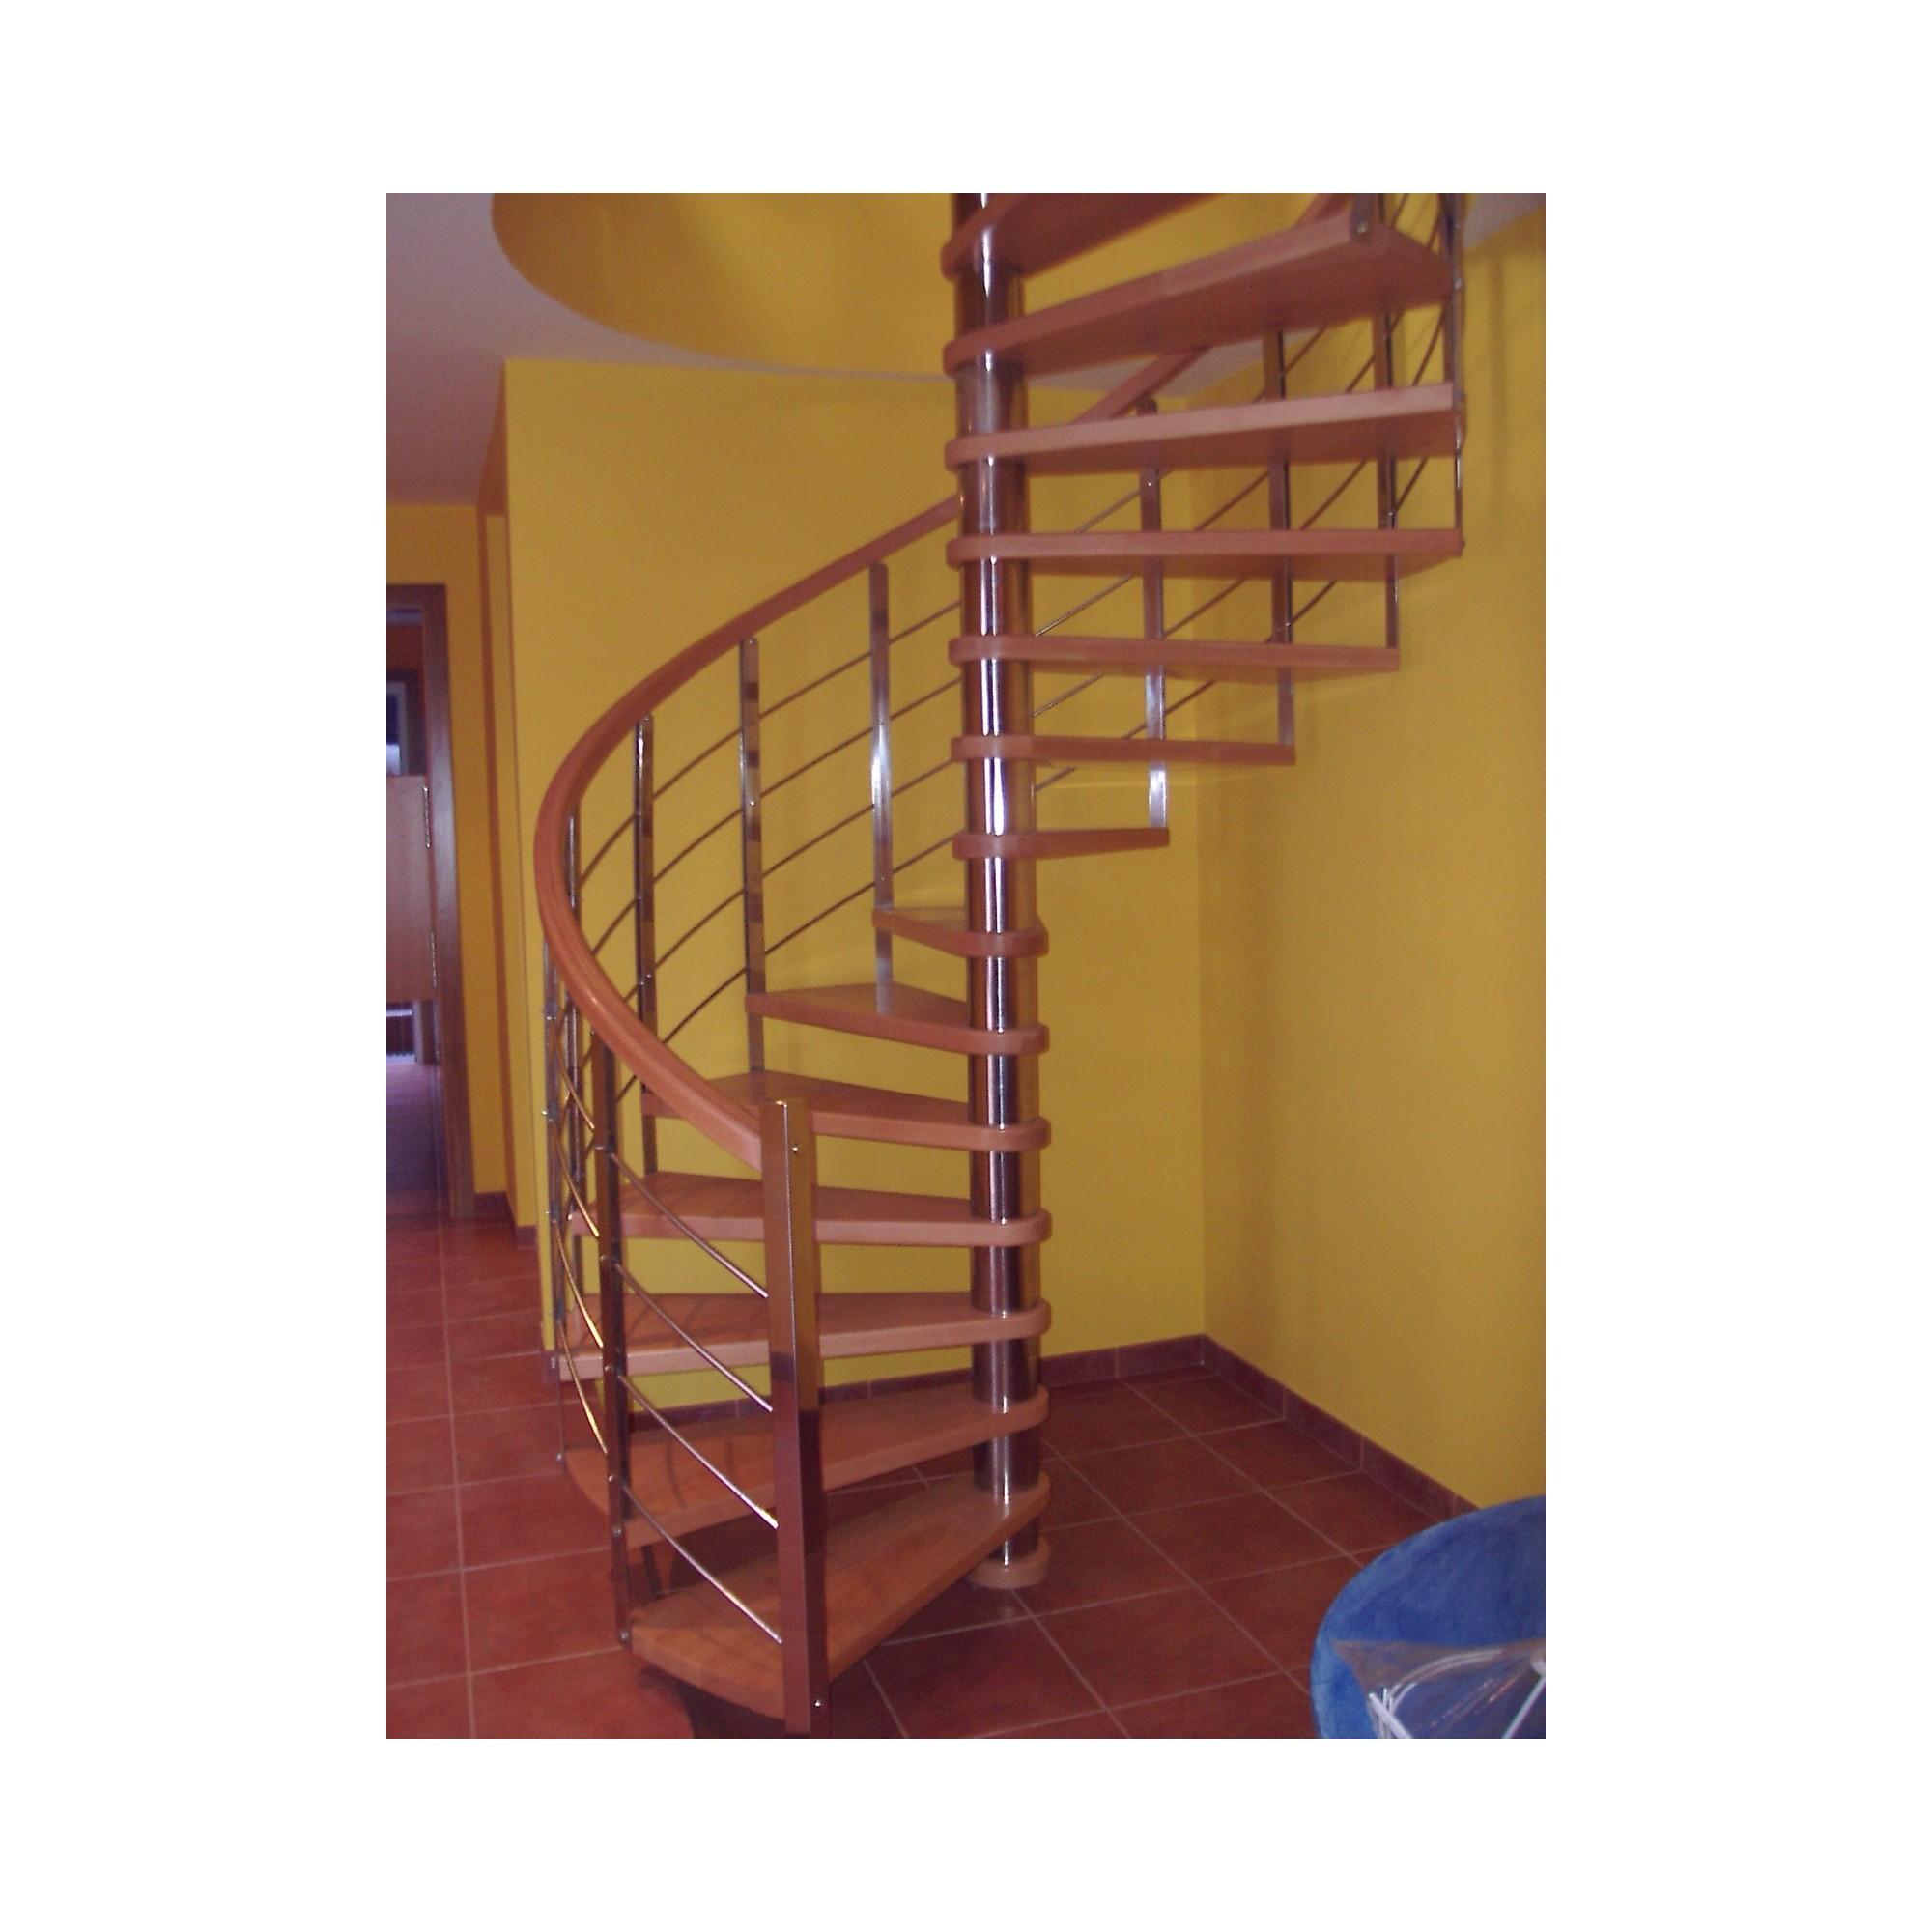 Escalera caracol a medida modelo arte for Plano escalera madera